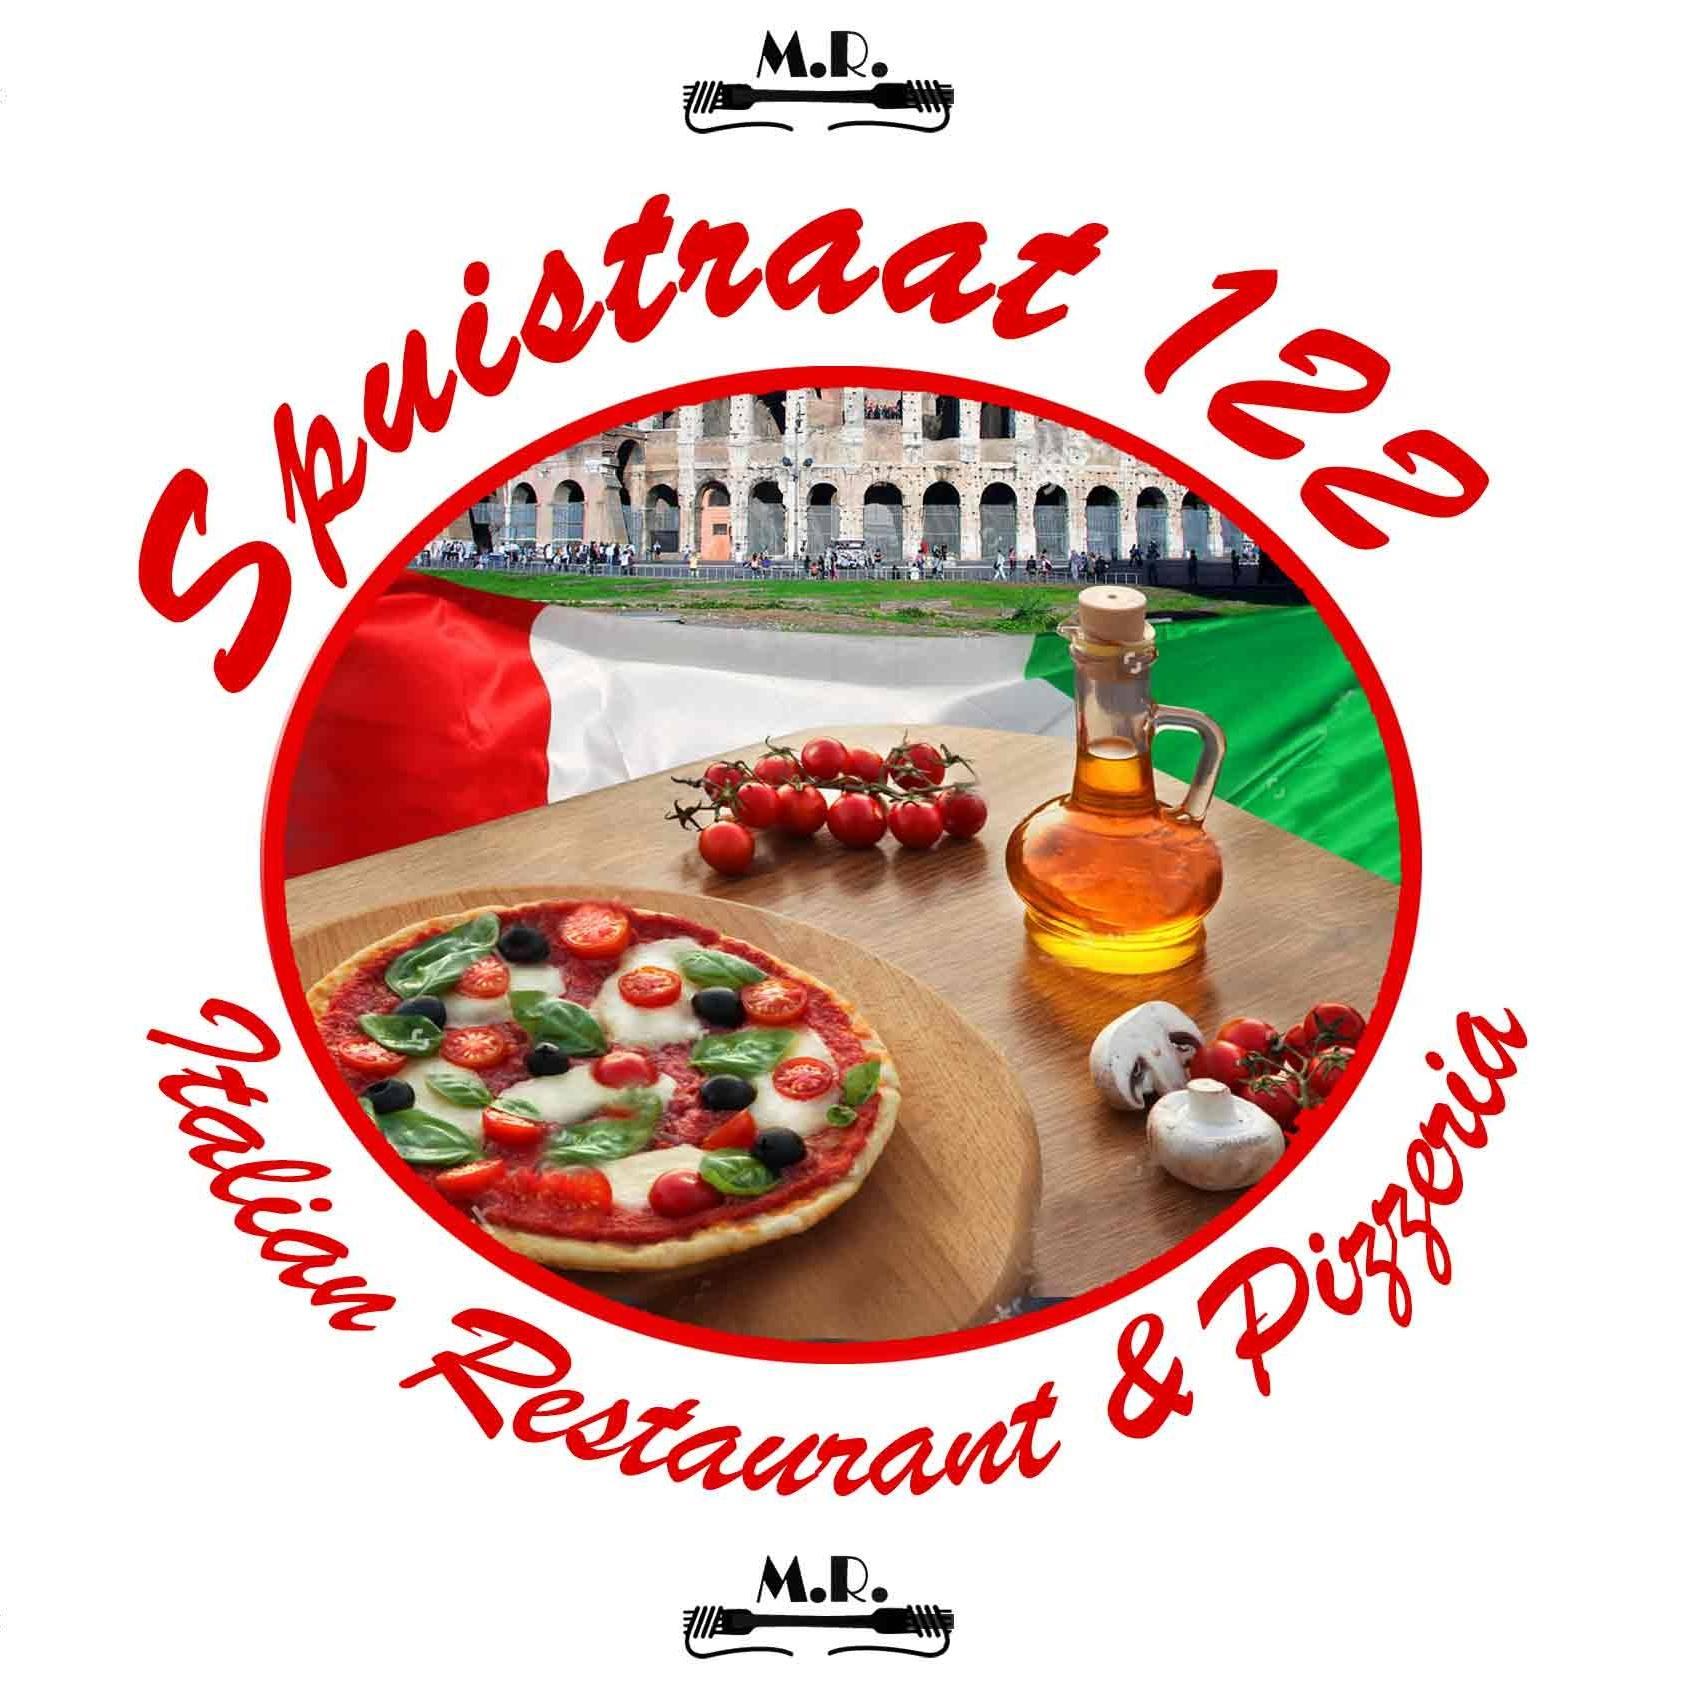 20% korting op alle pizza's @M.R. Italian Restaurant & Pizzeria Amsterdam